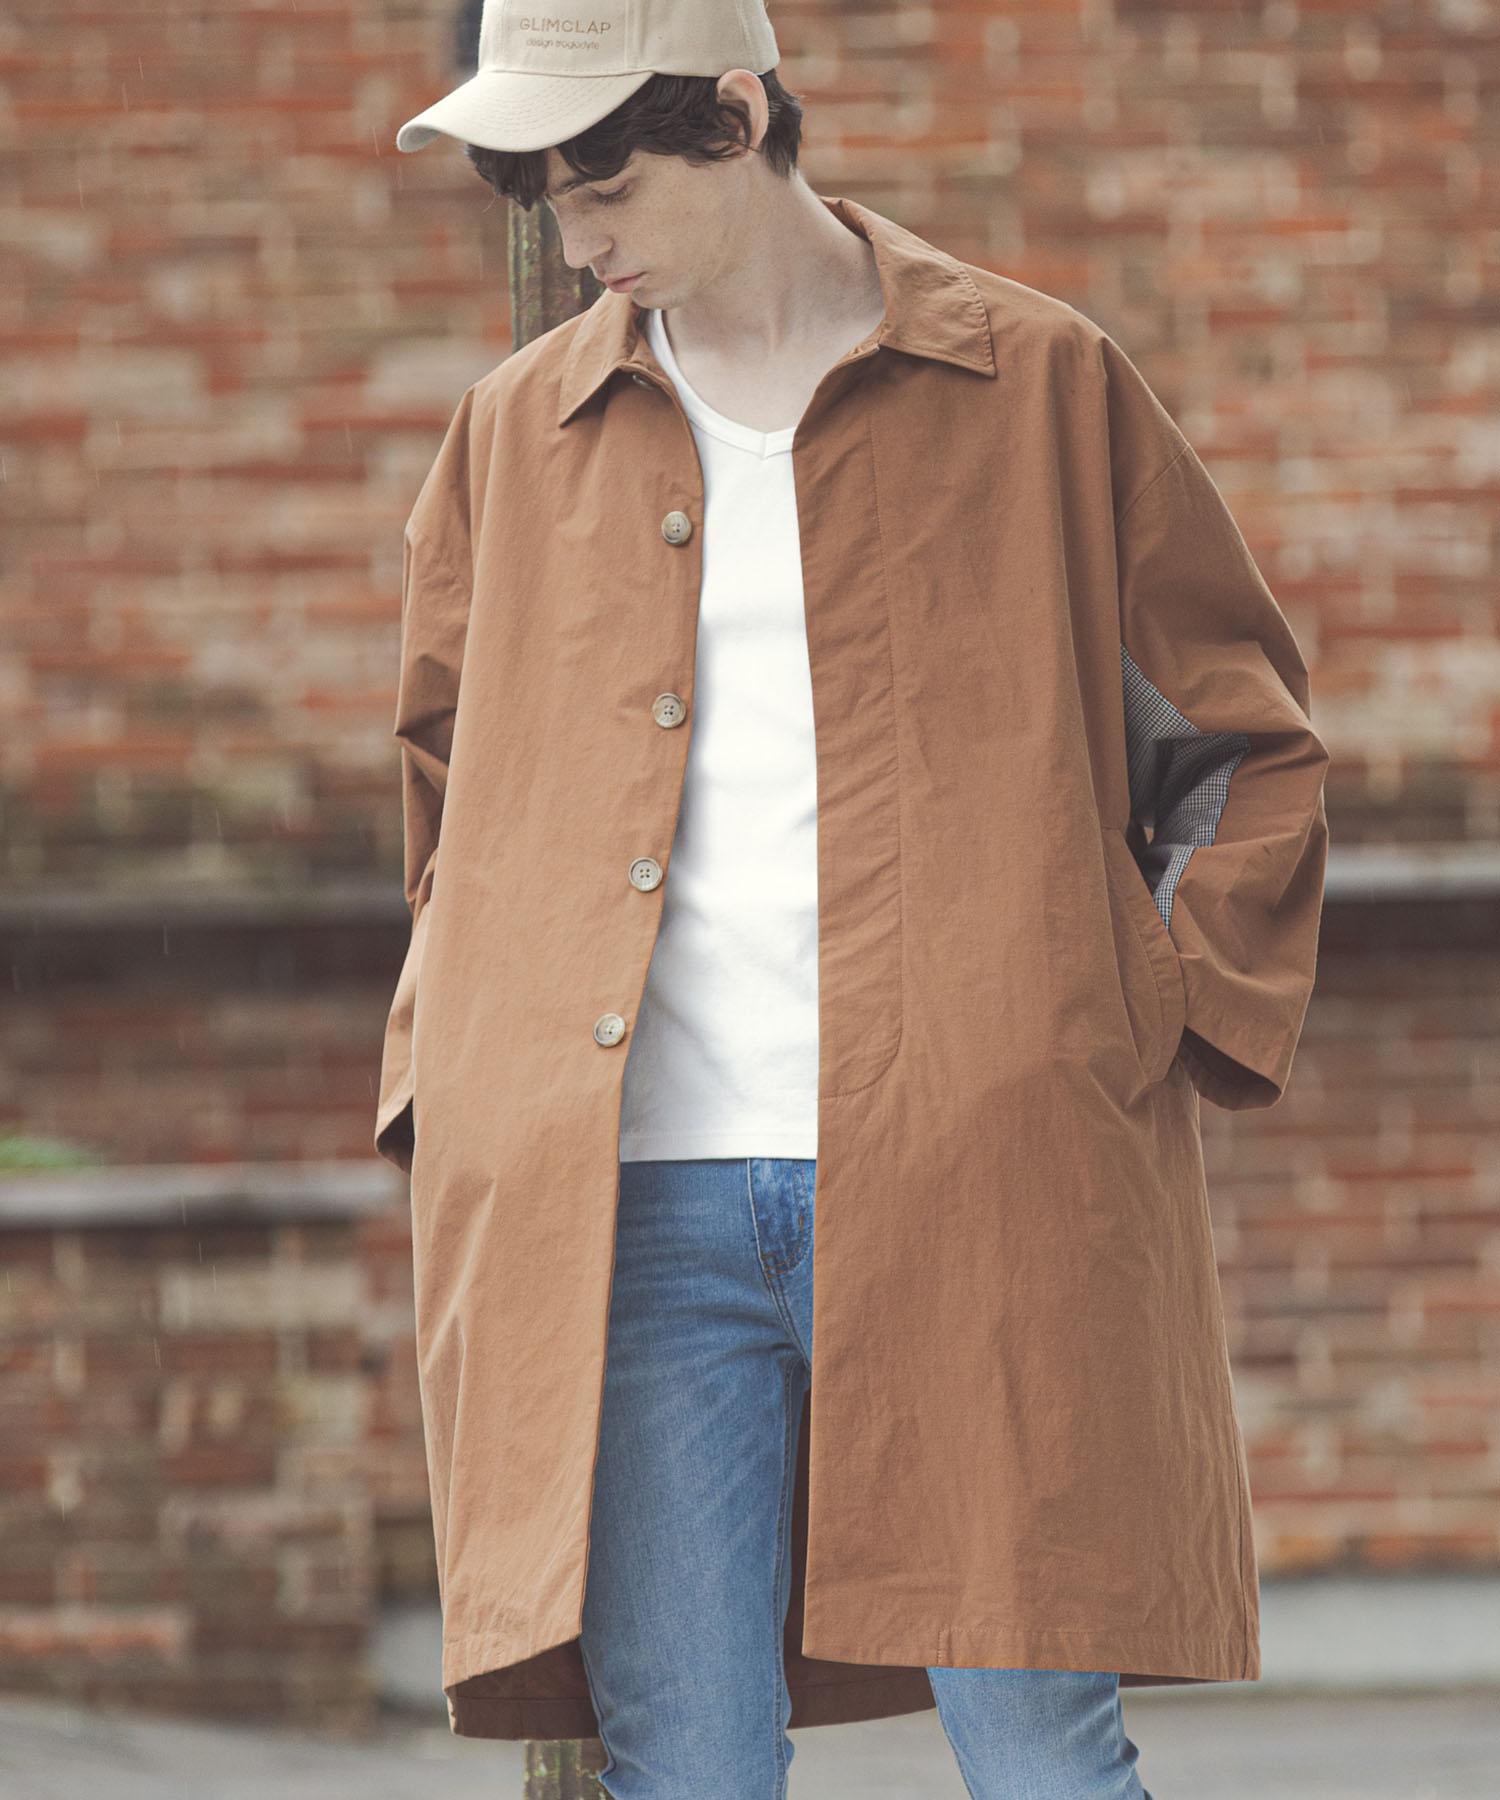 【GLIMCLAP(グリムクラップ)】Loose silhouette Balmacaan Coat コート(01gls-ca)